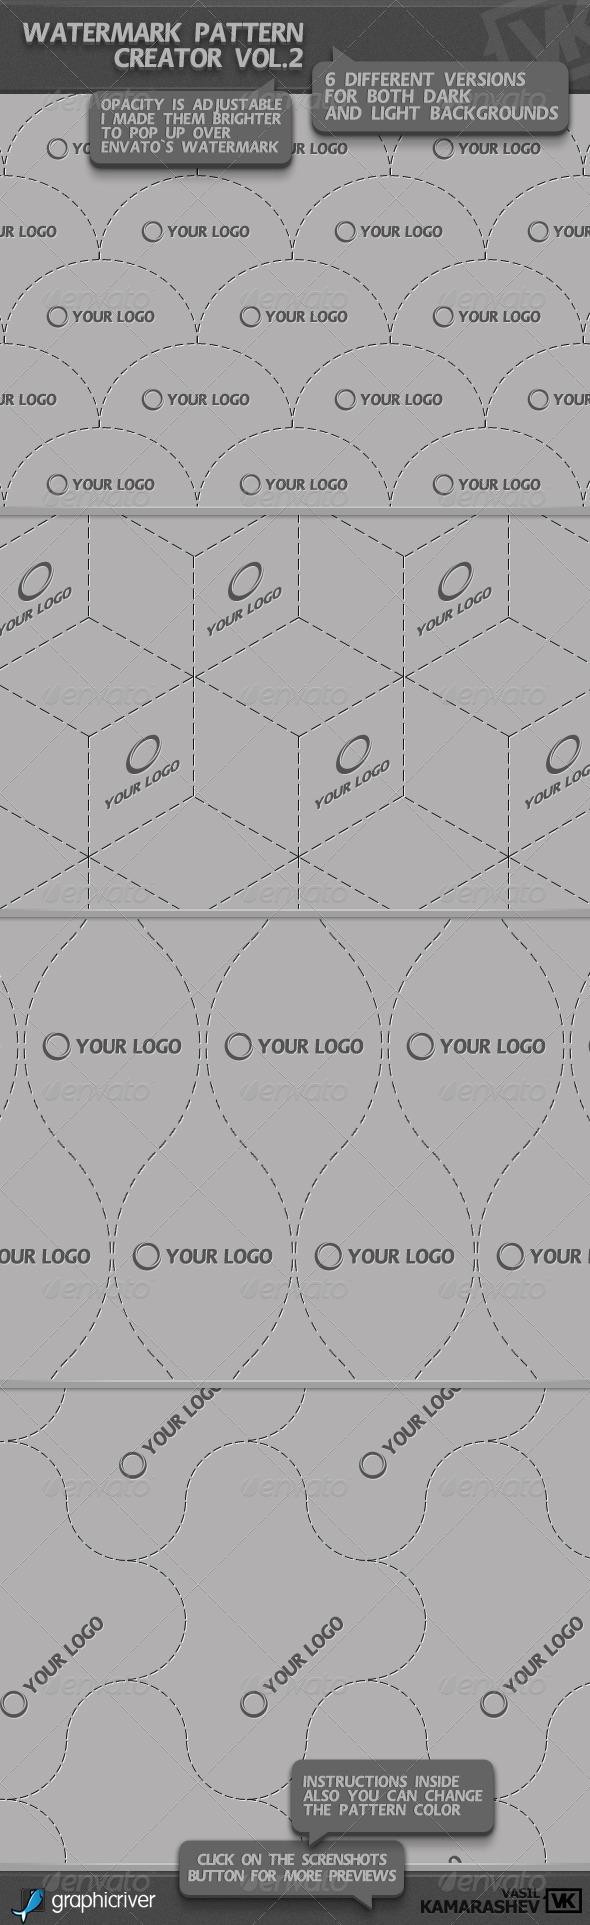 GraphicRiver Watermark Pattern Creator vol.2 1581166